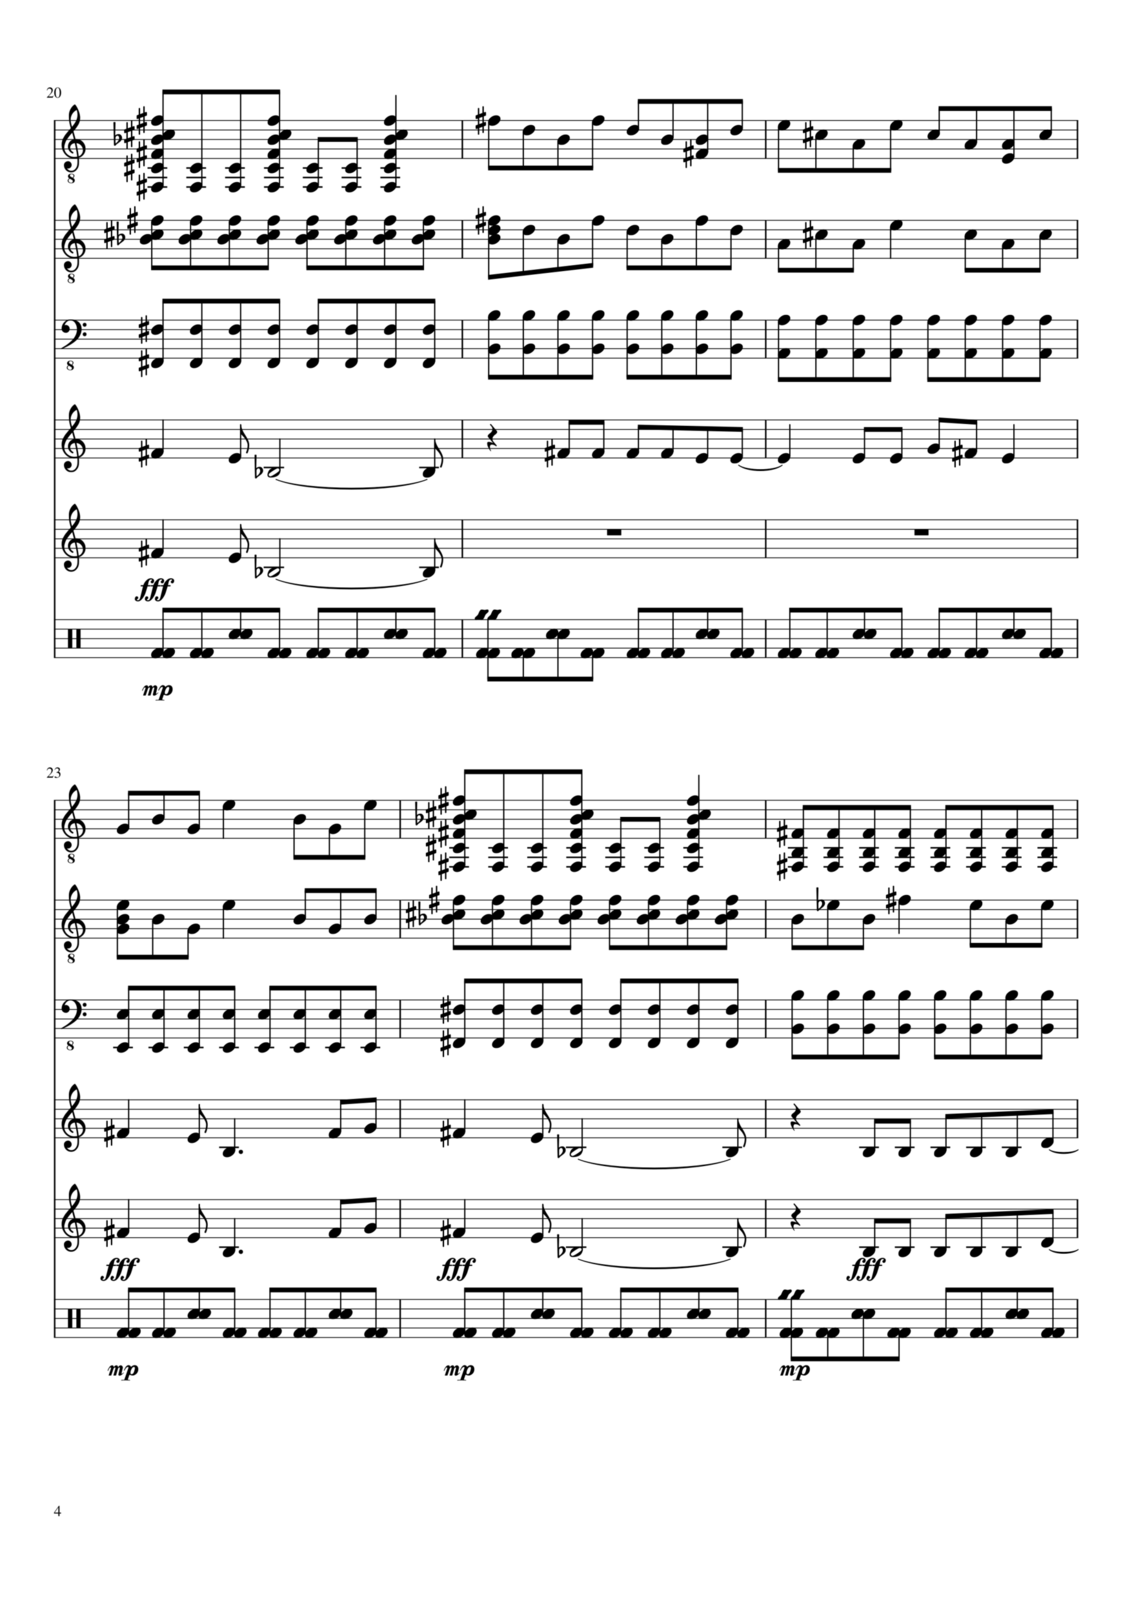 Ot Bolshogo Uma slide, Image 4